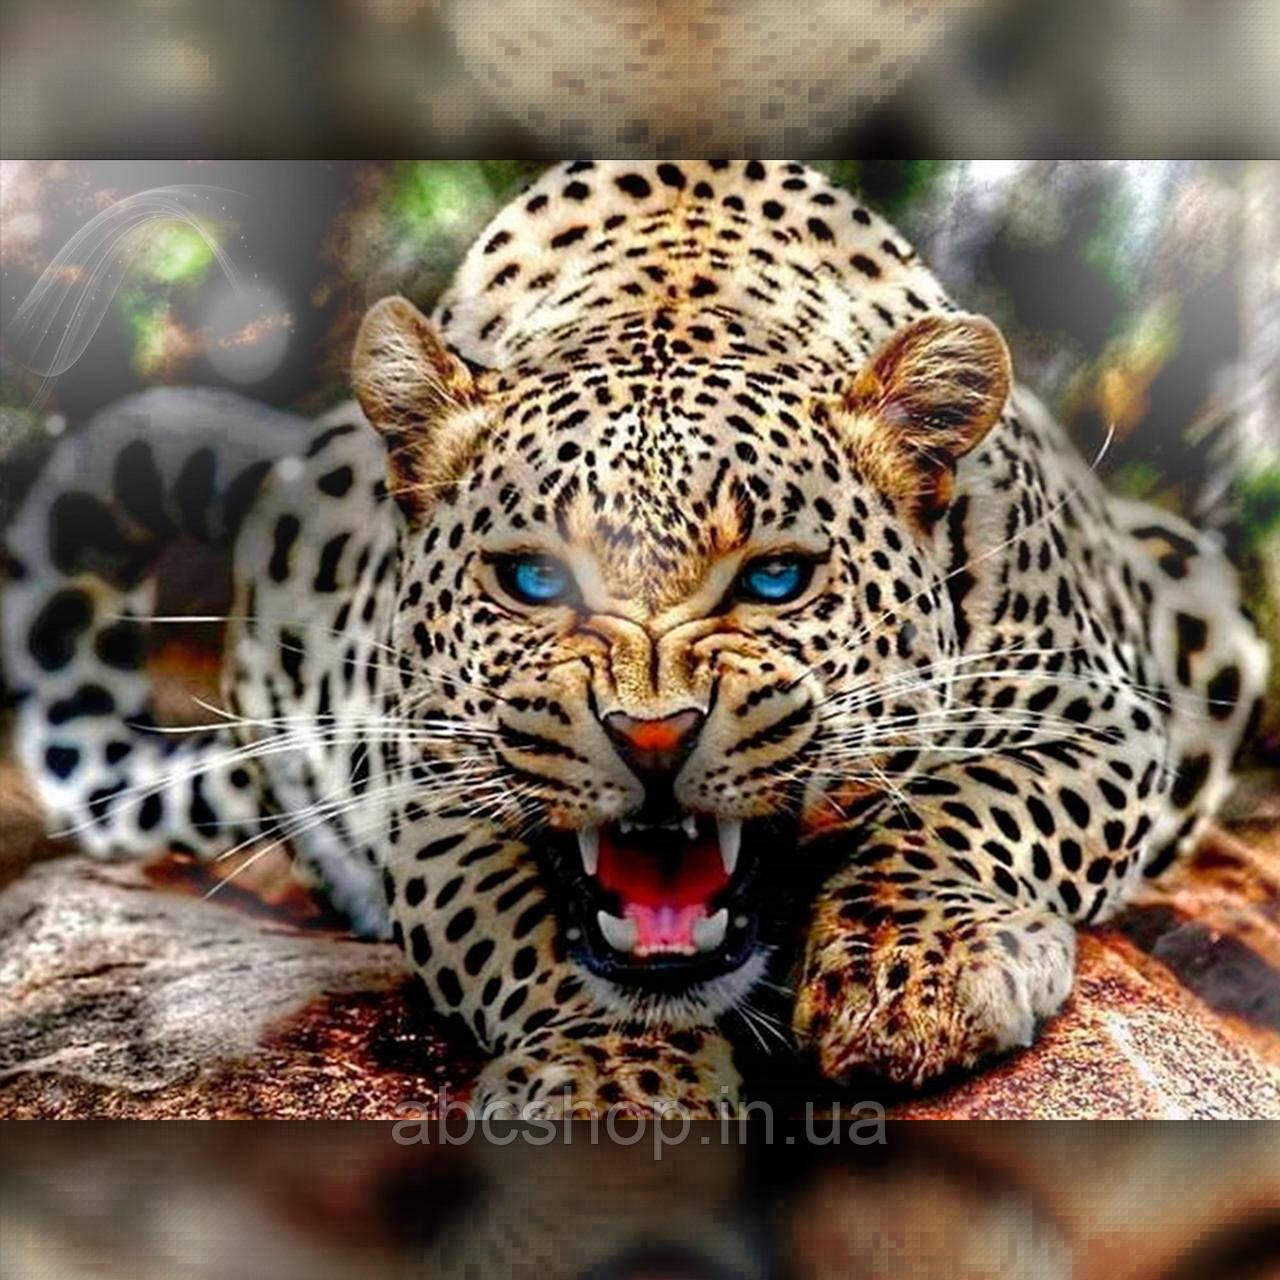 Алмазная вышивка Злой леопард 40x50 The Wortex Diamonds (TWD20065L)